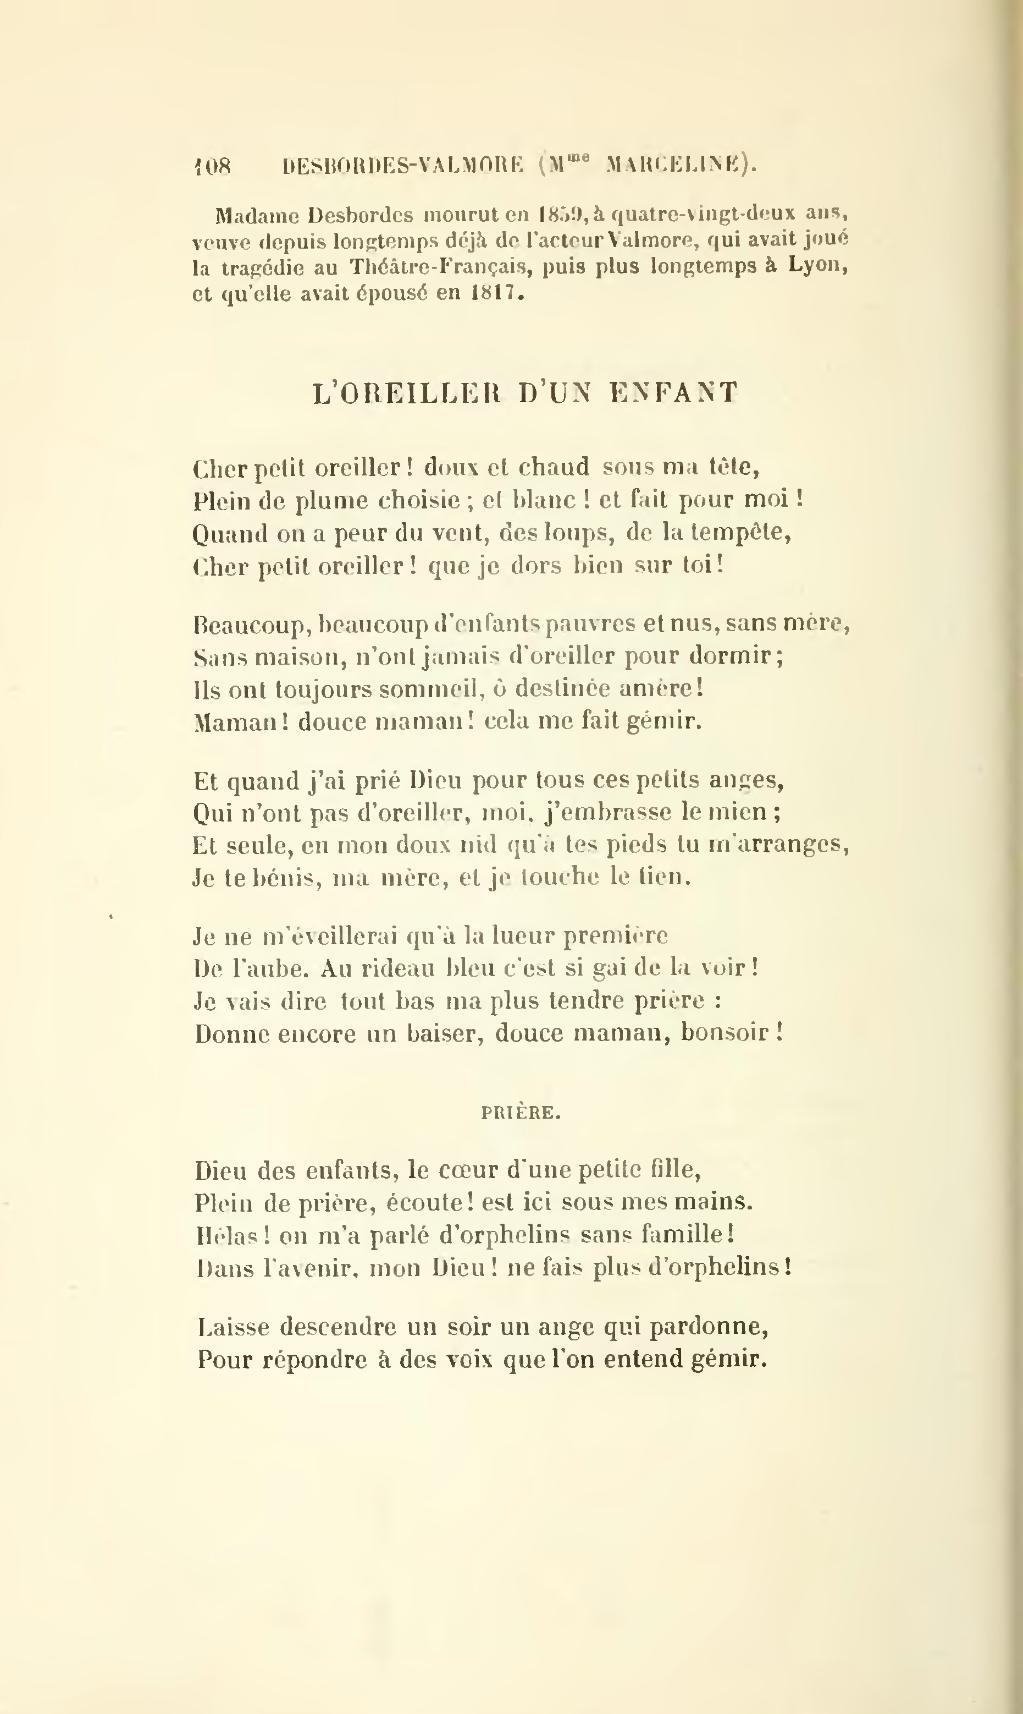 romantique 1880 djvu 124 wikisource